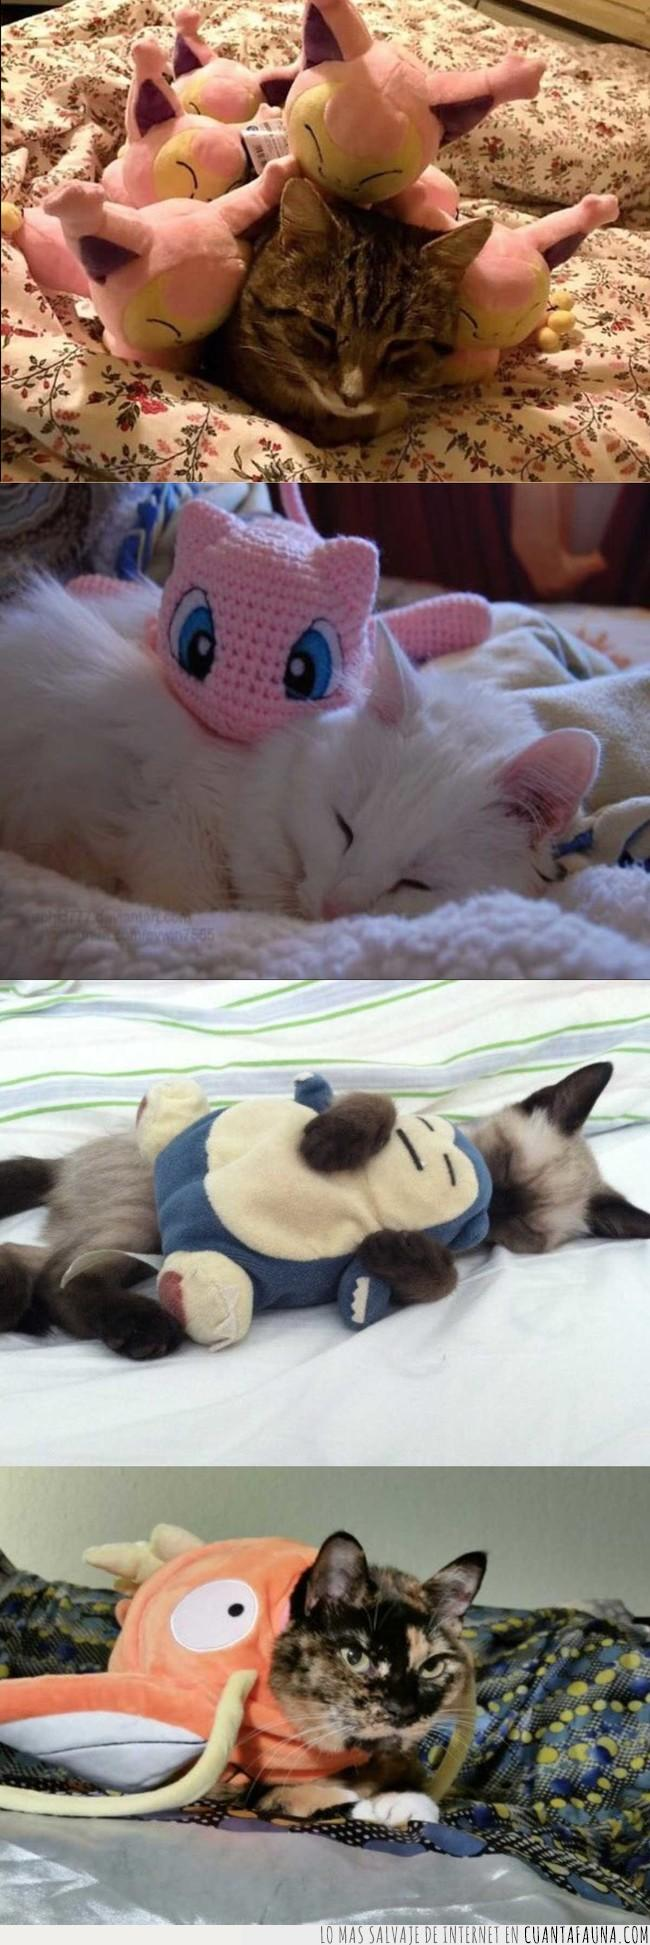 cama,dormir,gatos,necesitar,paz,peluches,pokémon